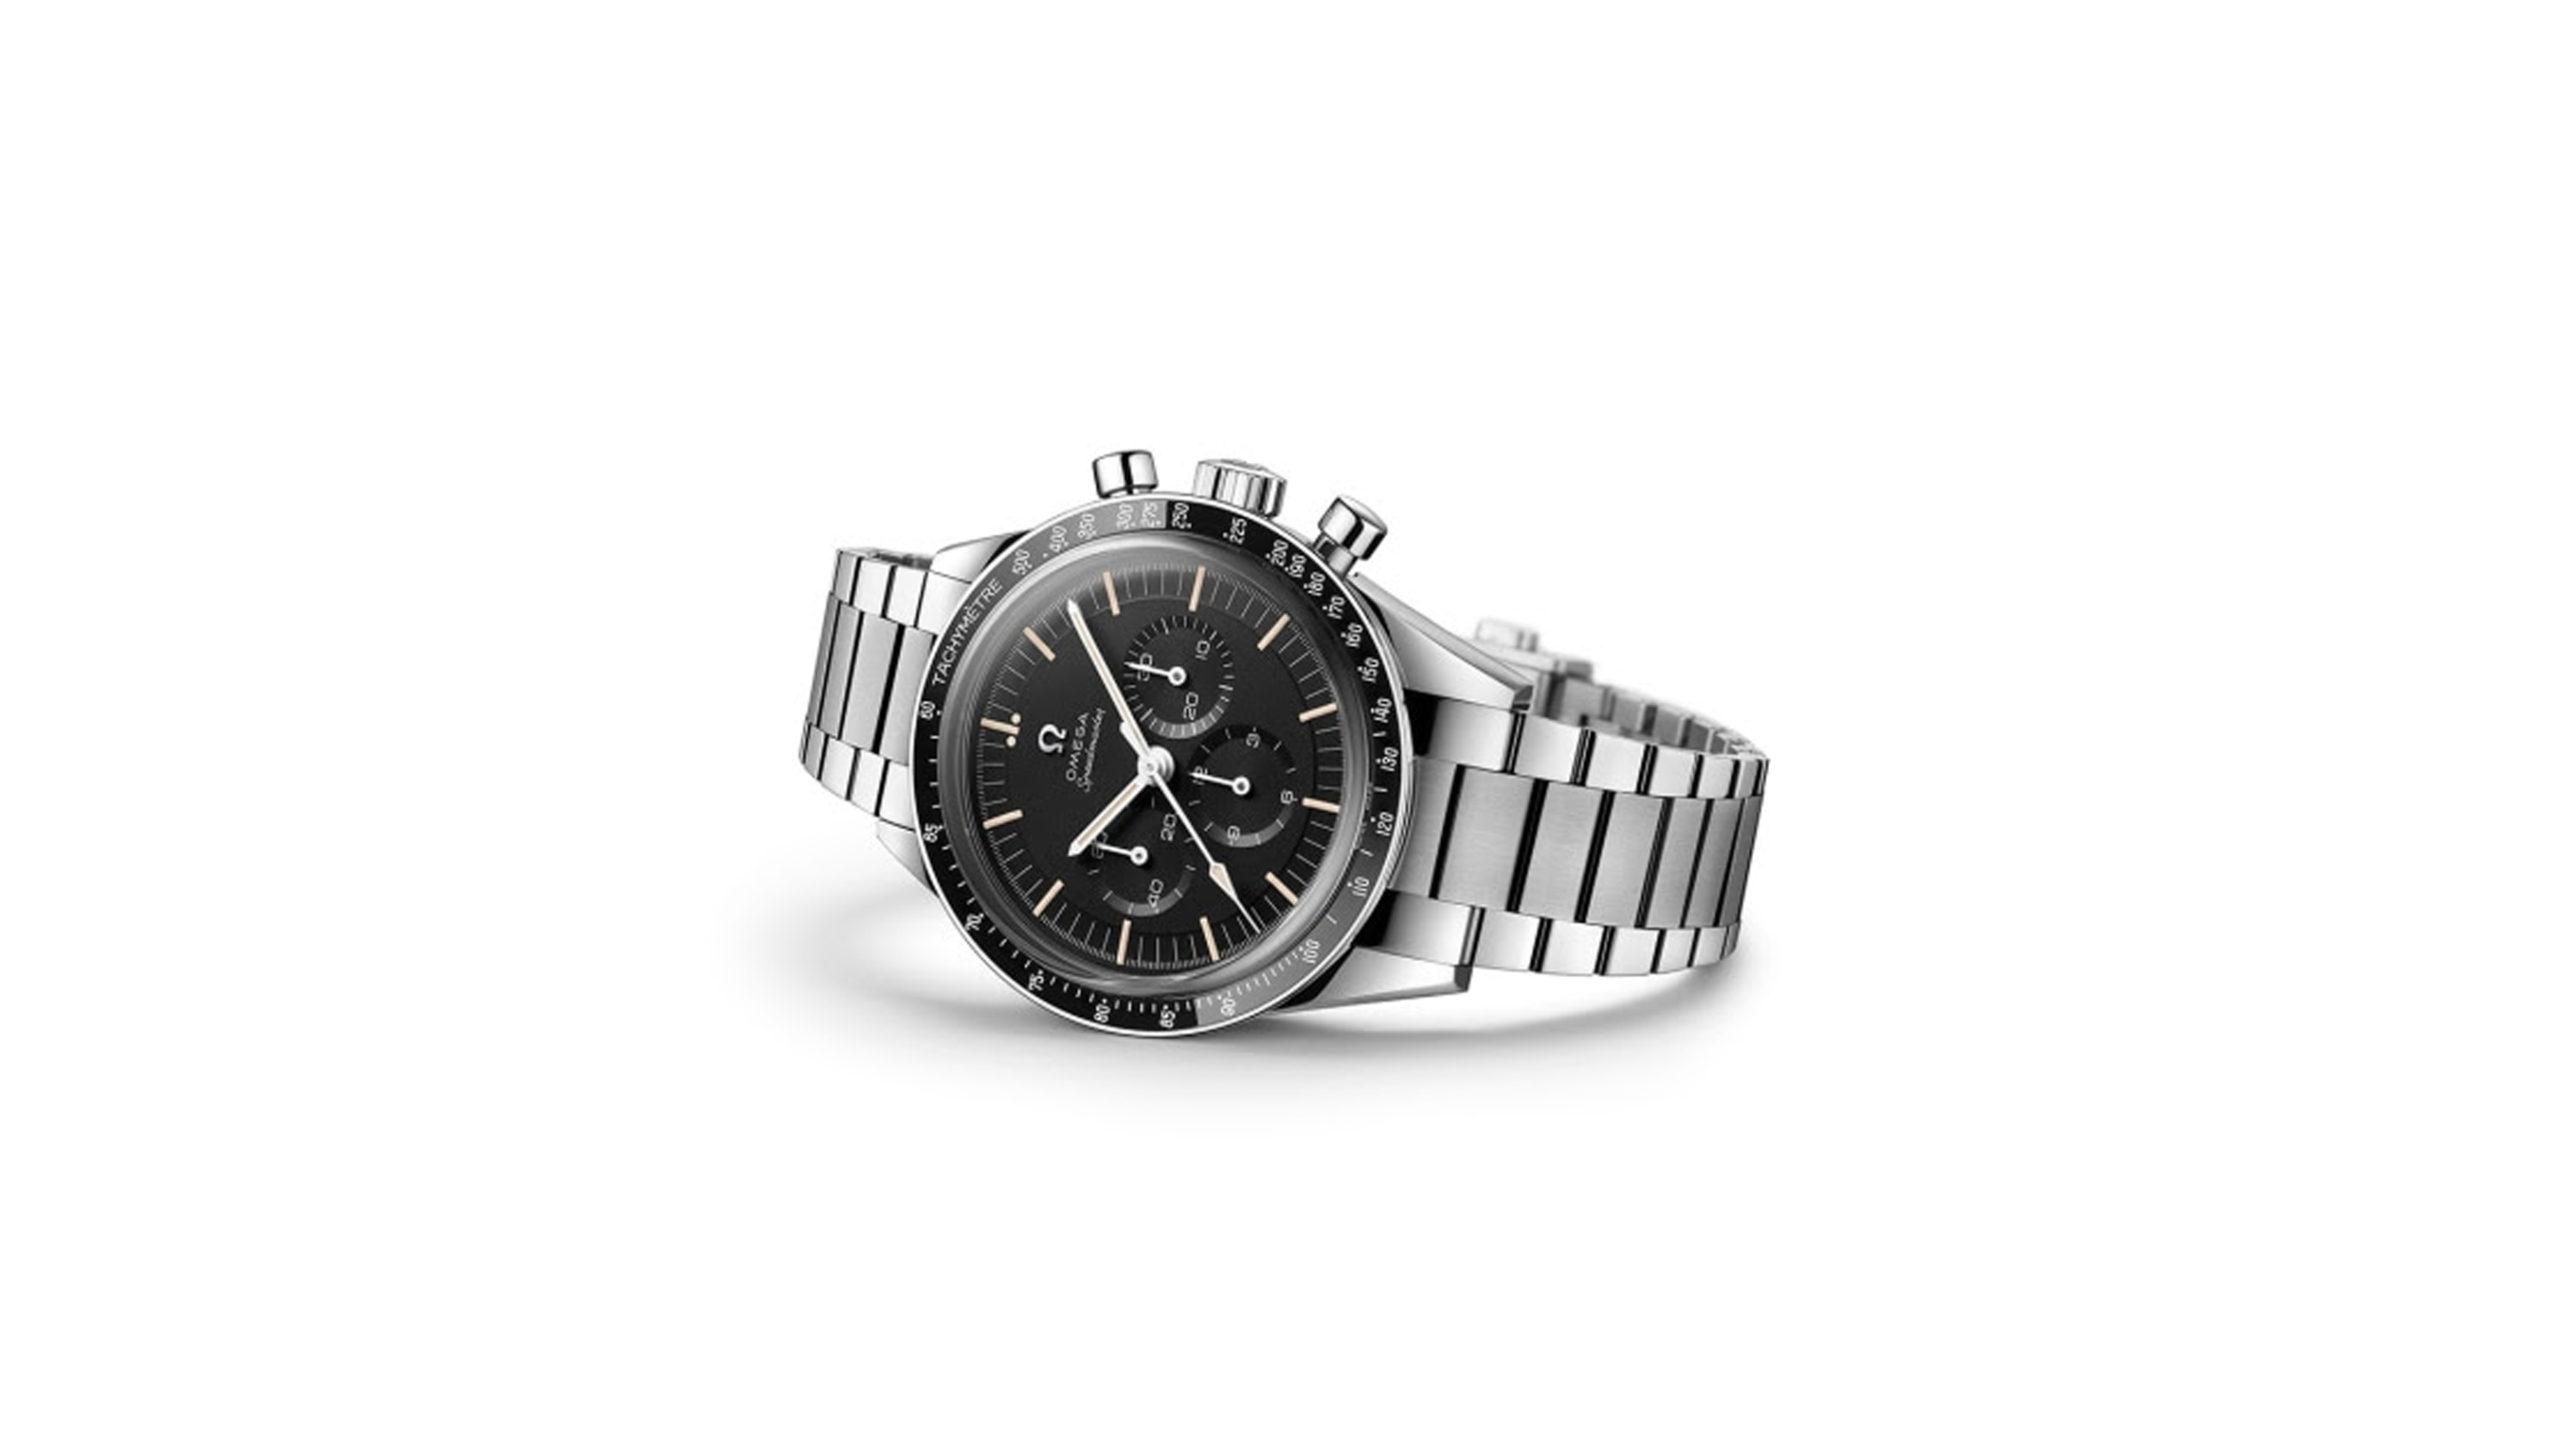 dit is de omega speedmaster moonwatch 321 stainless steel